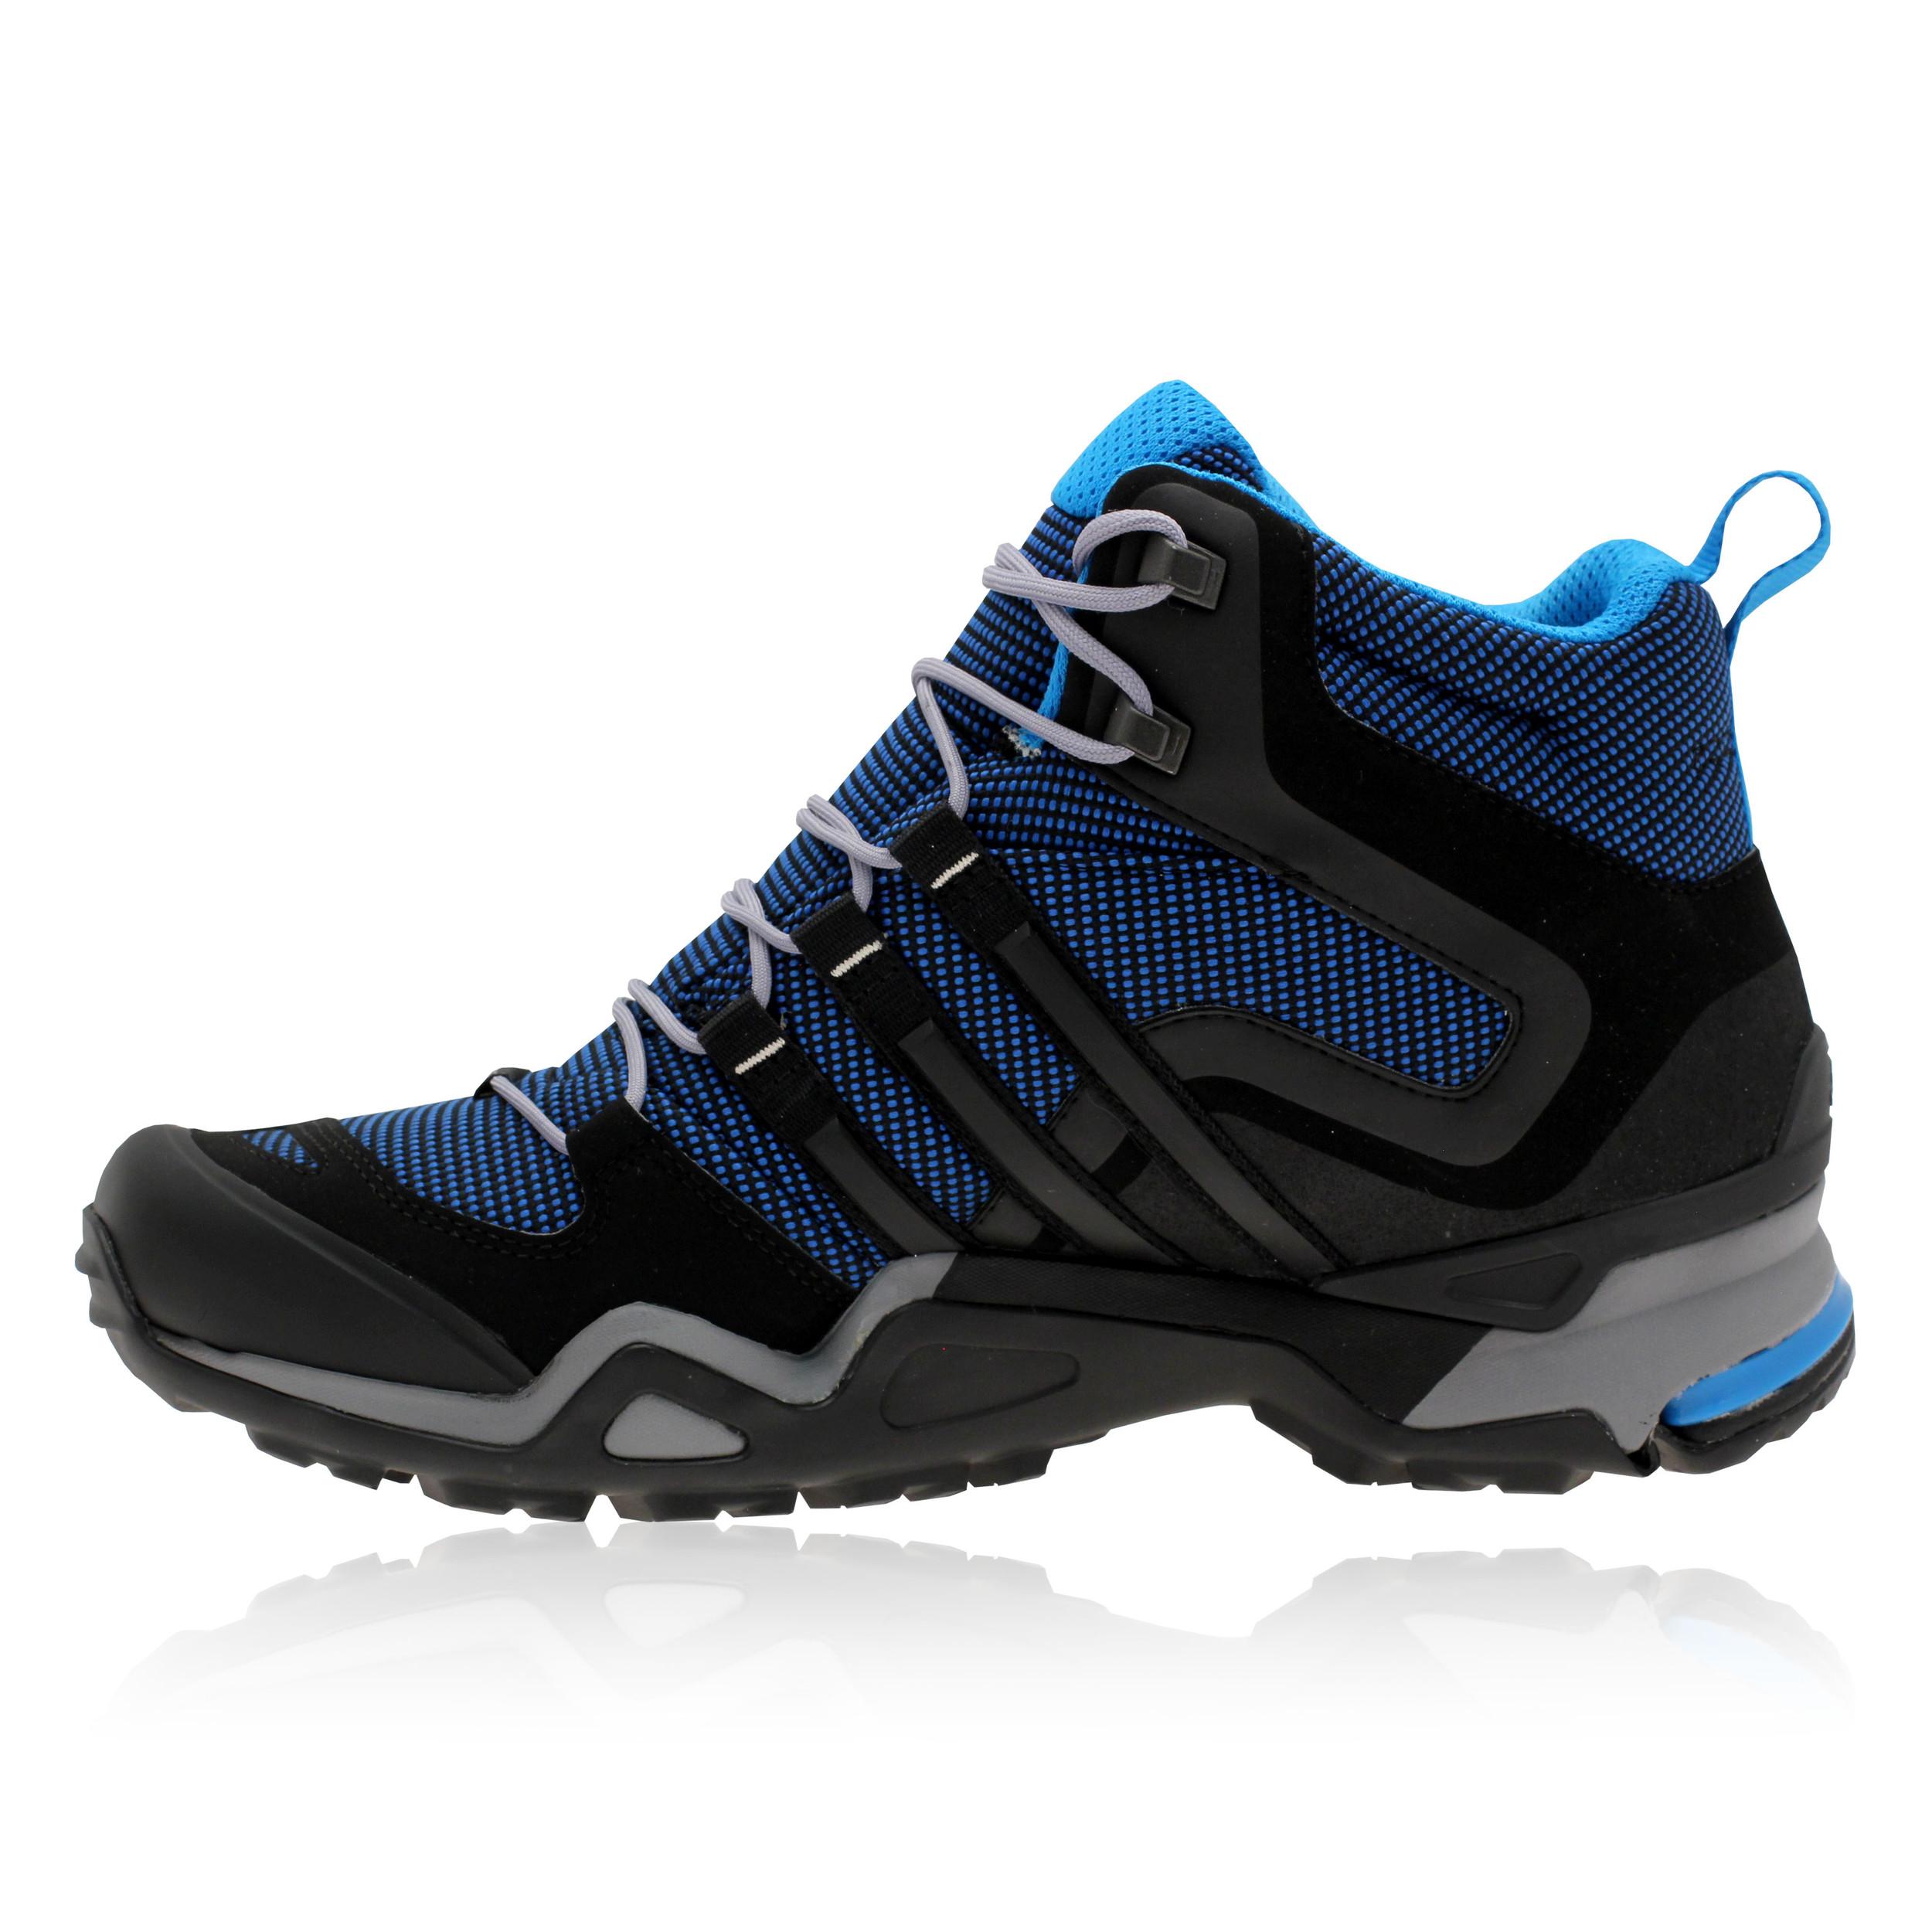 adidas terrex fast x high tex trail walking shoes